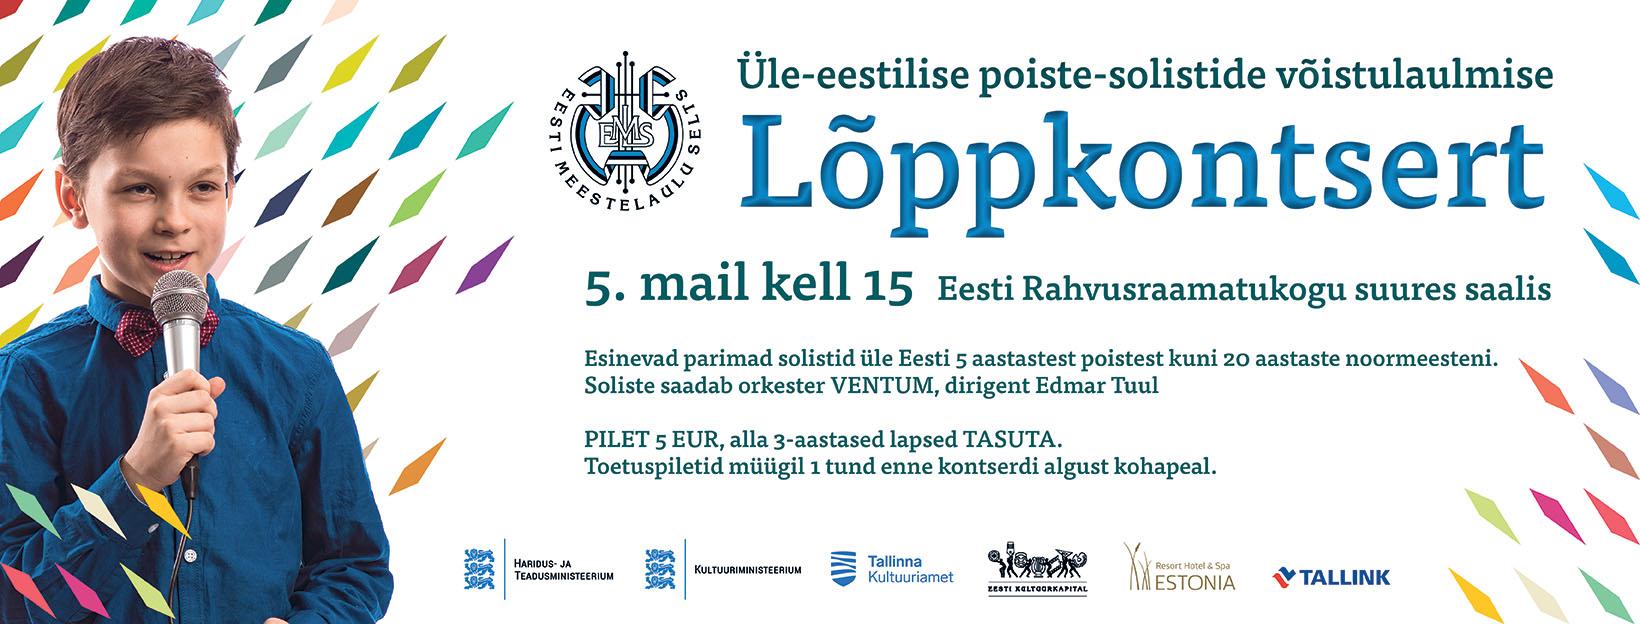 Poisid_solistid_loppkontsert